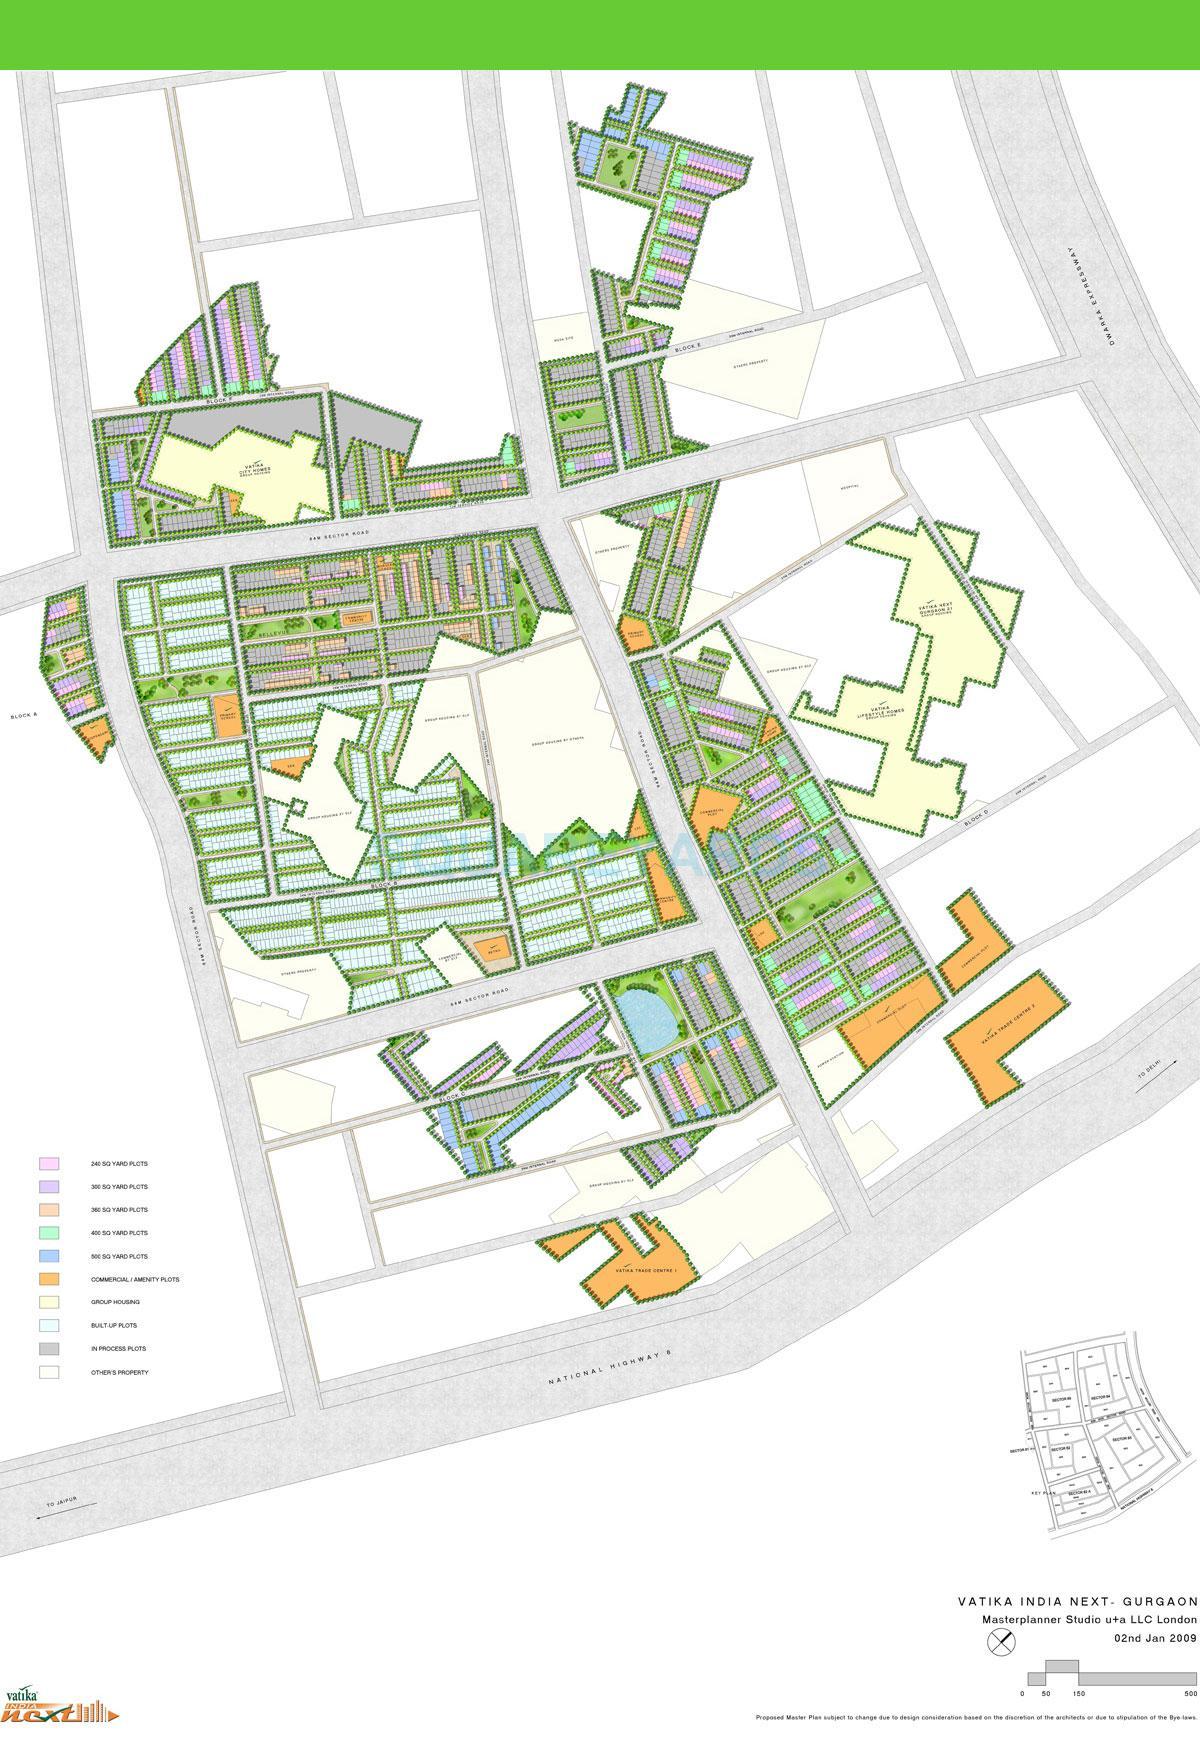 vatika inxt floors master plan image1